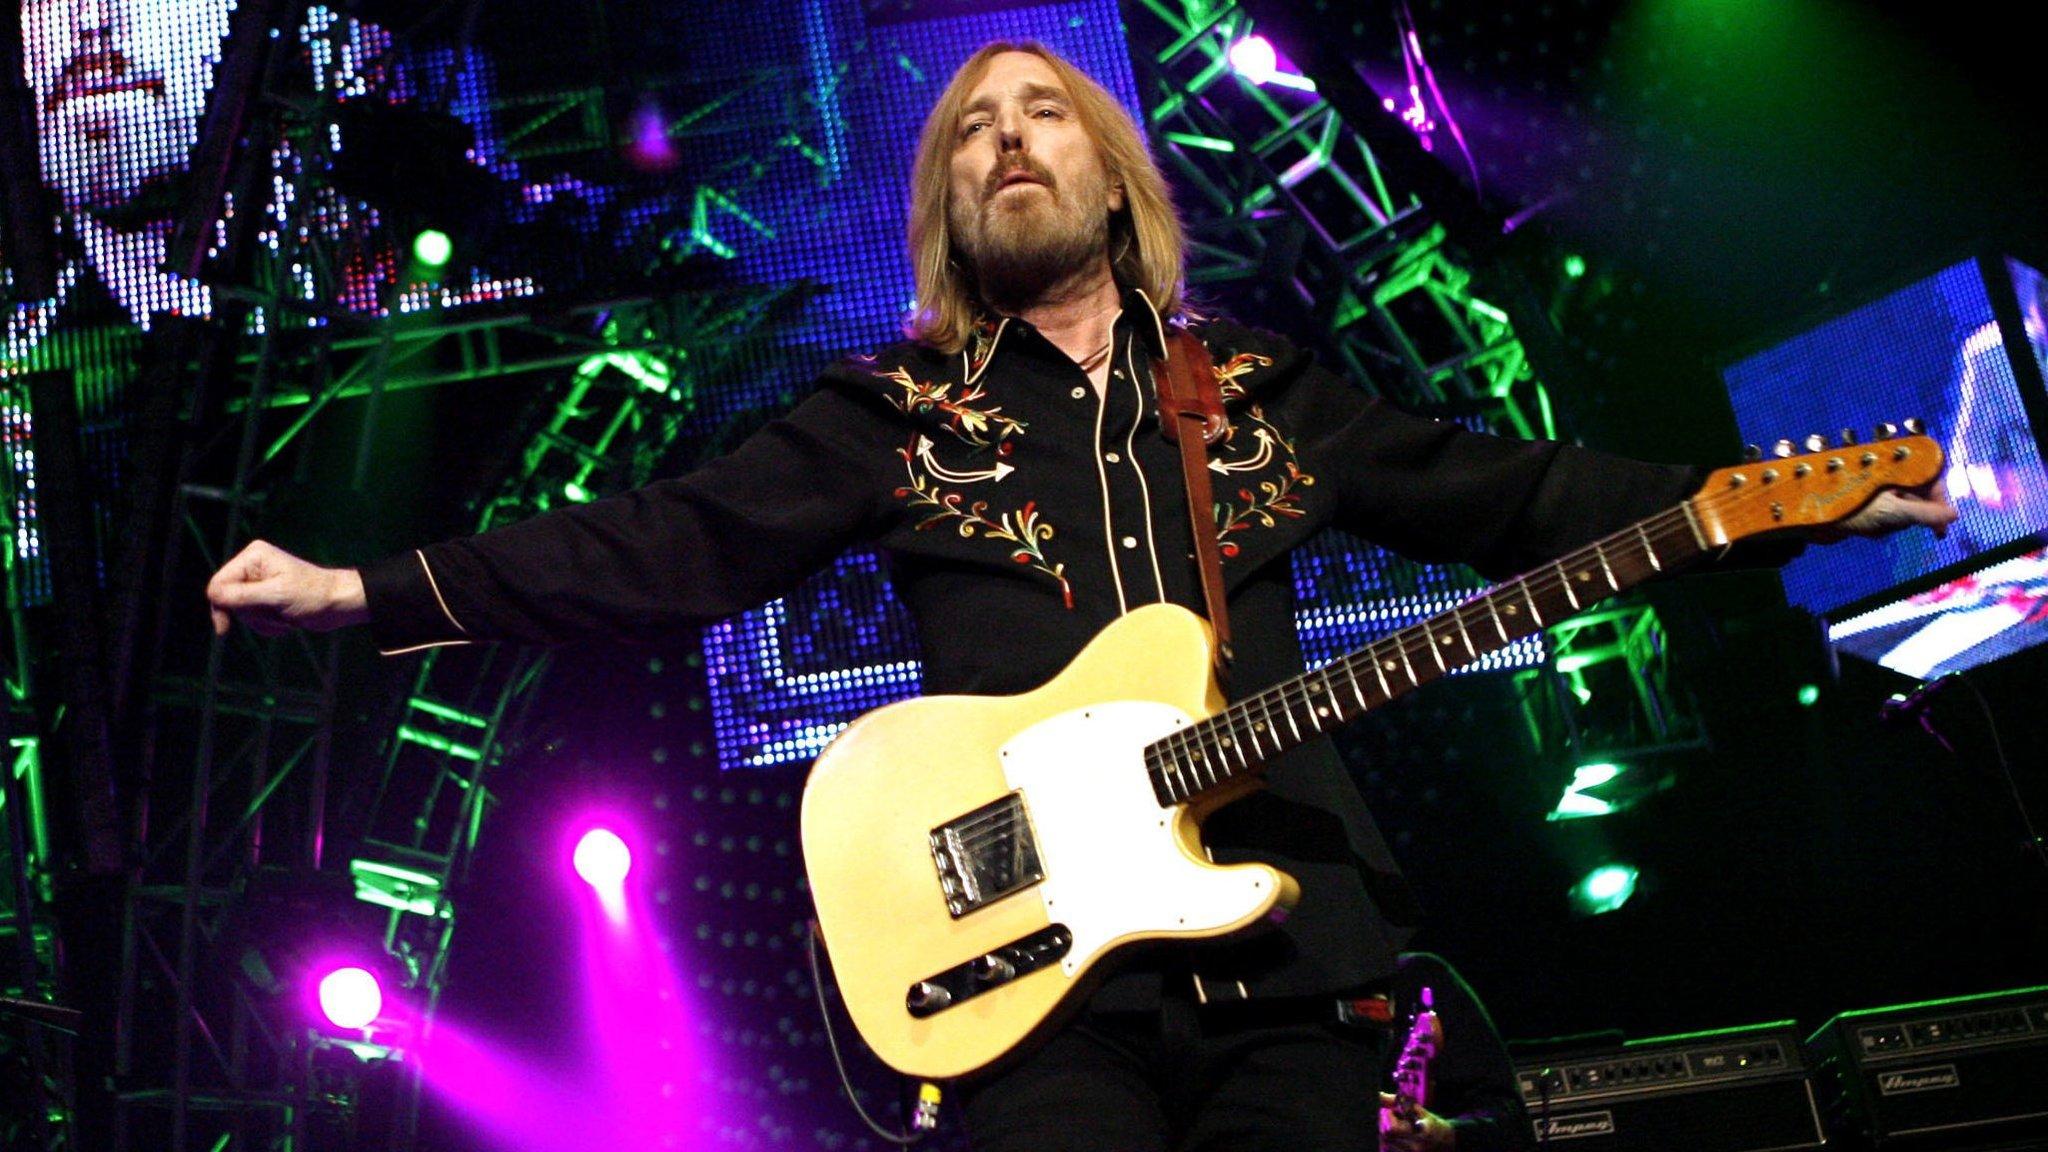 Tom Petty Rock Musician 1950 2017 Financial Times